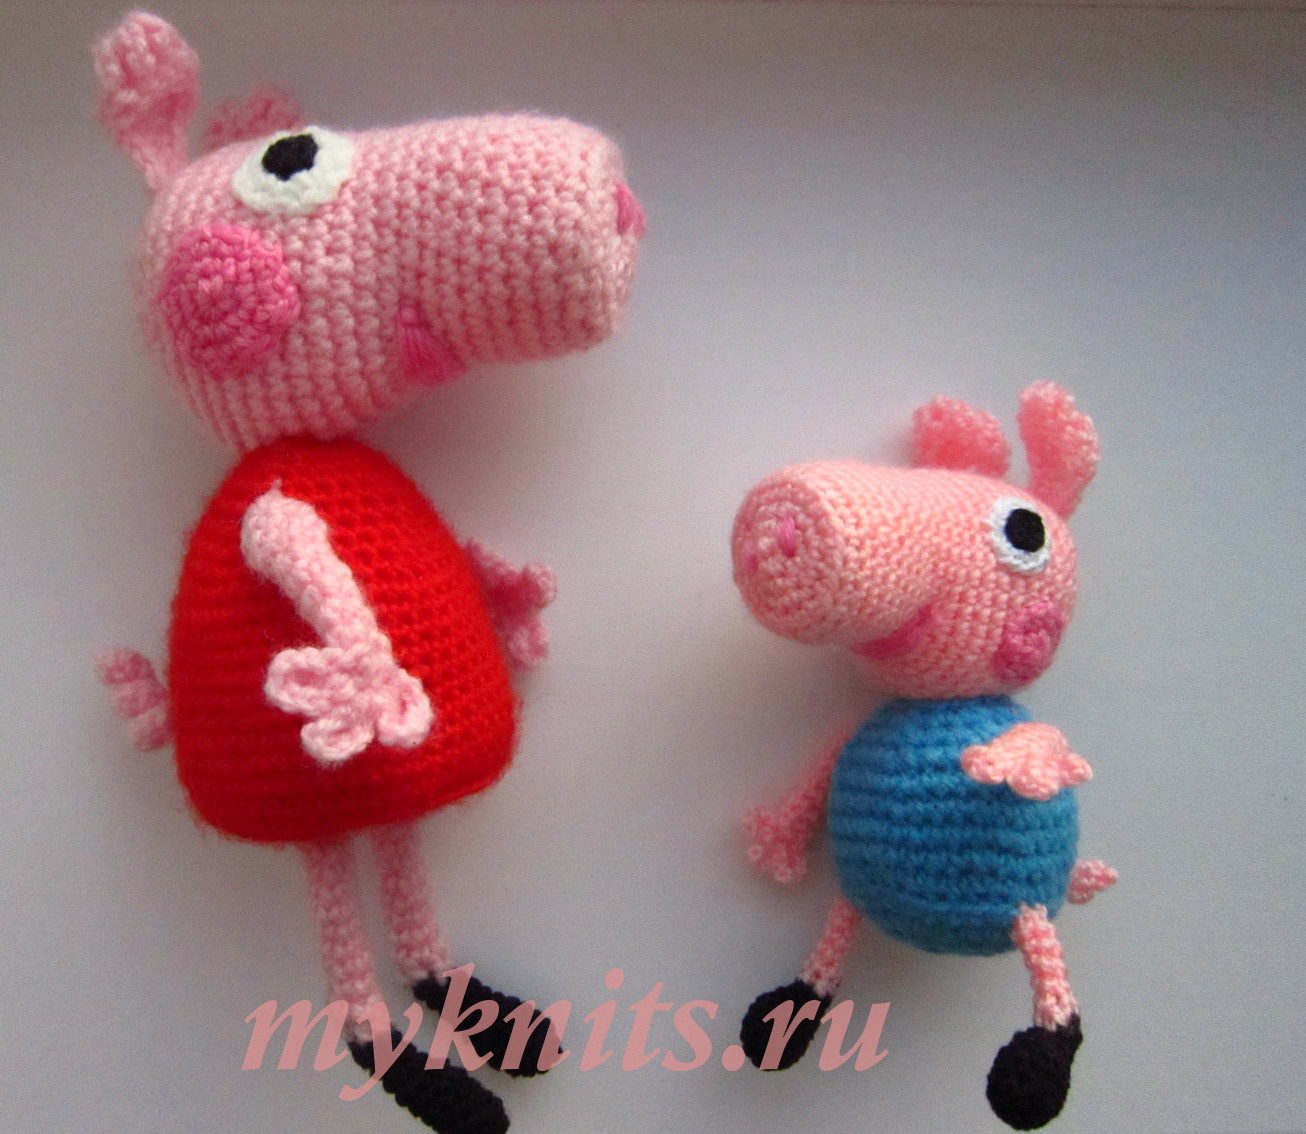 Myknitsru свинка пеппа и ее братик джордж вязание крючком